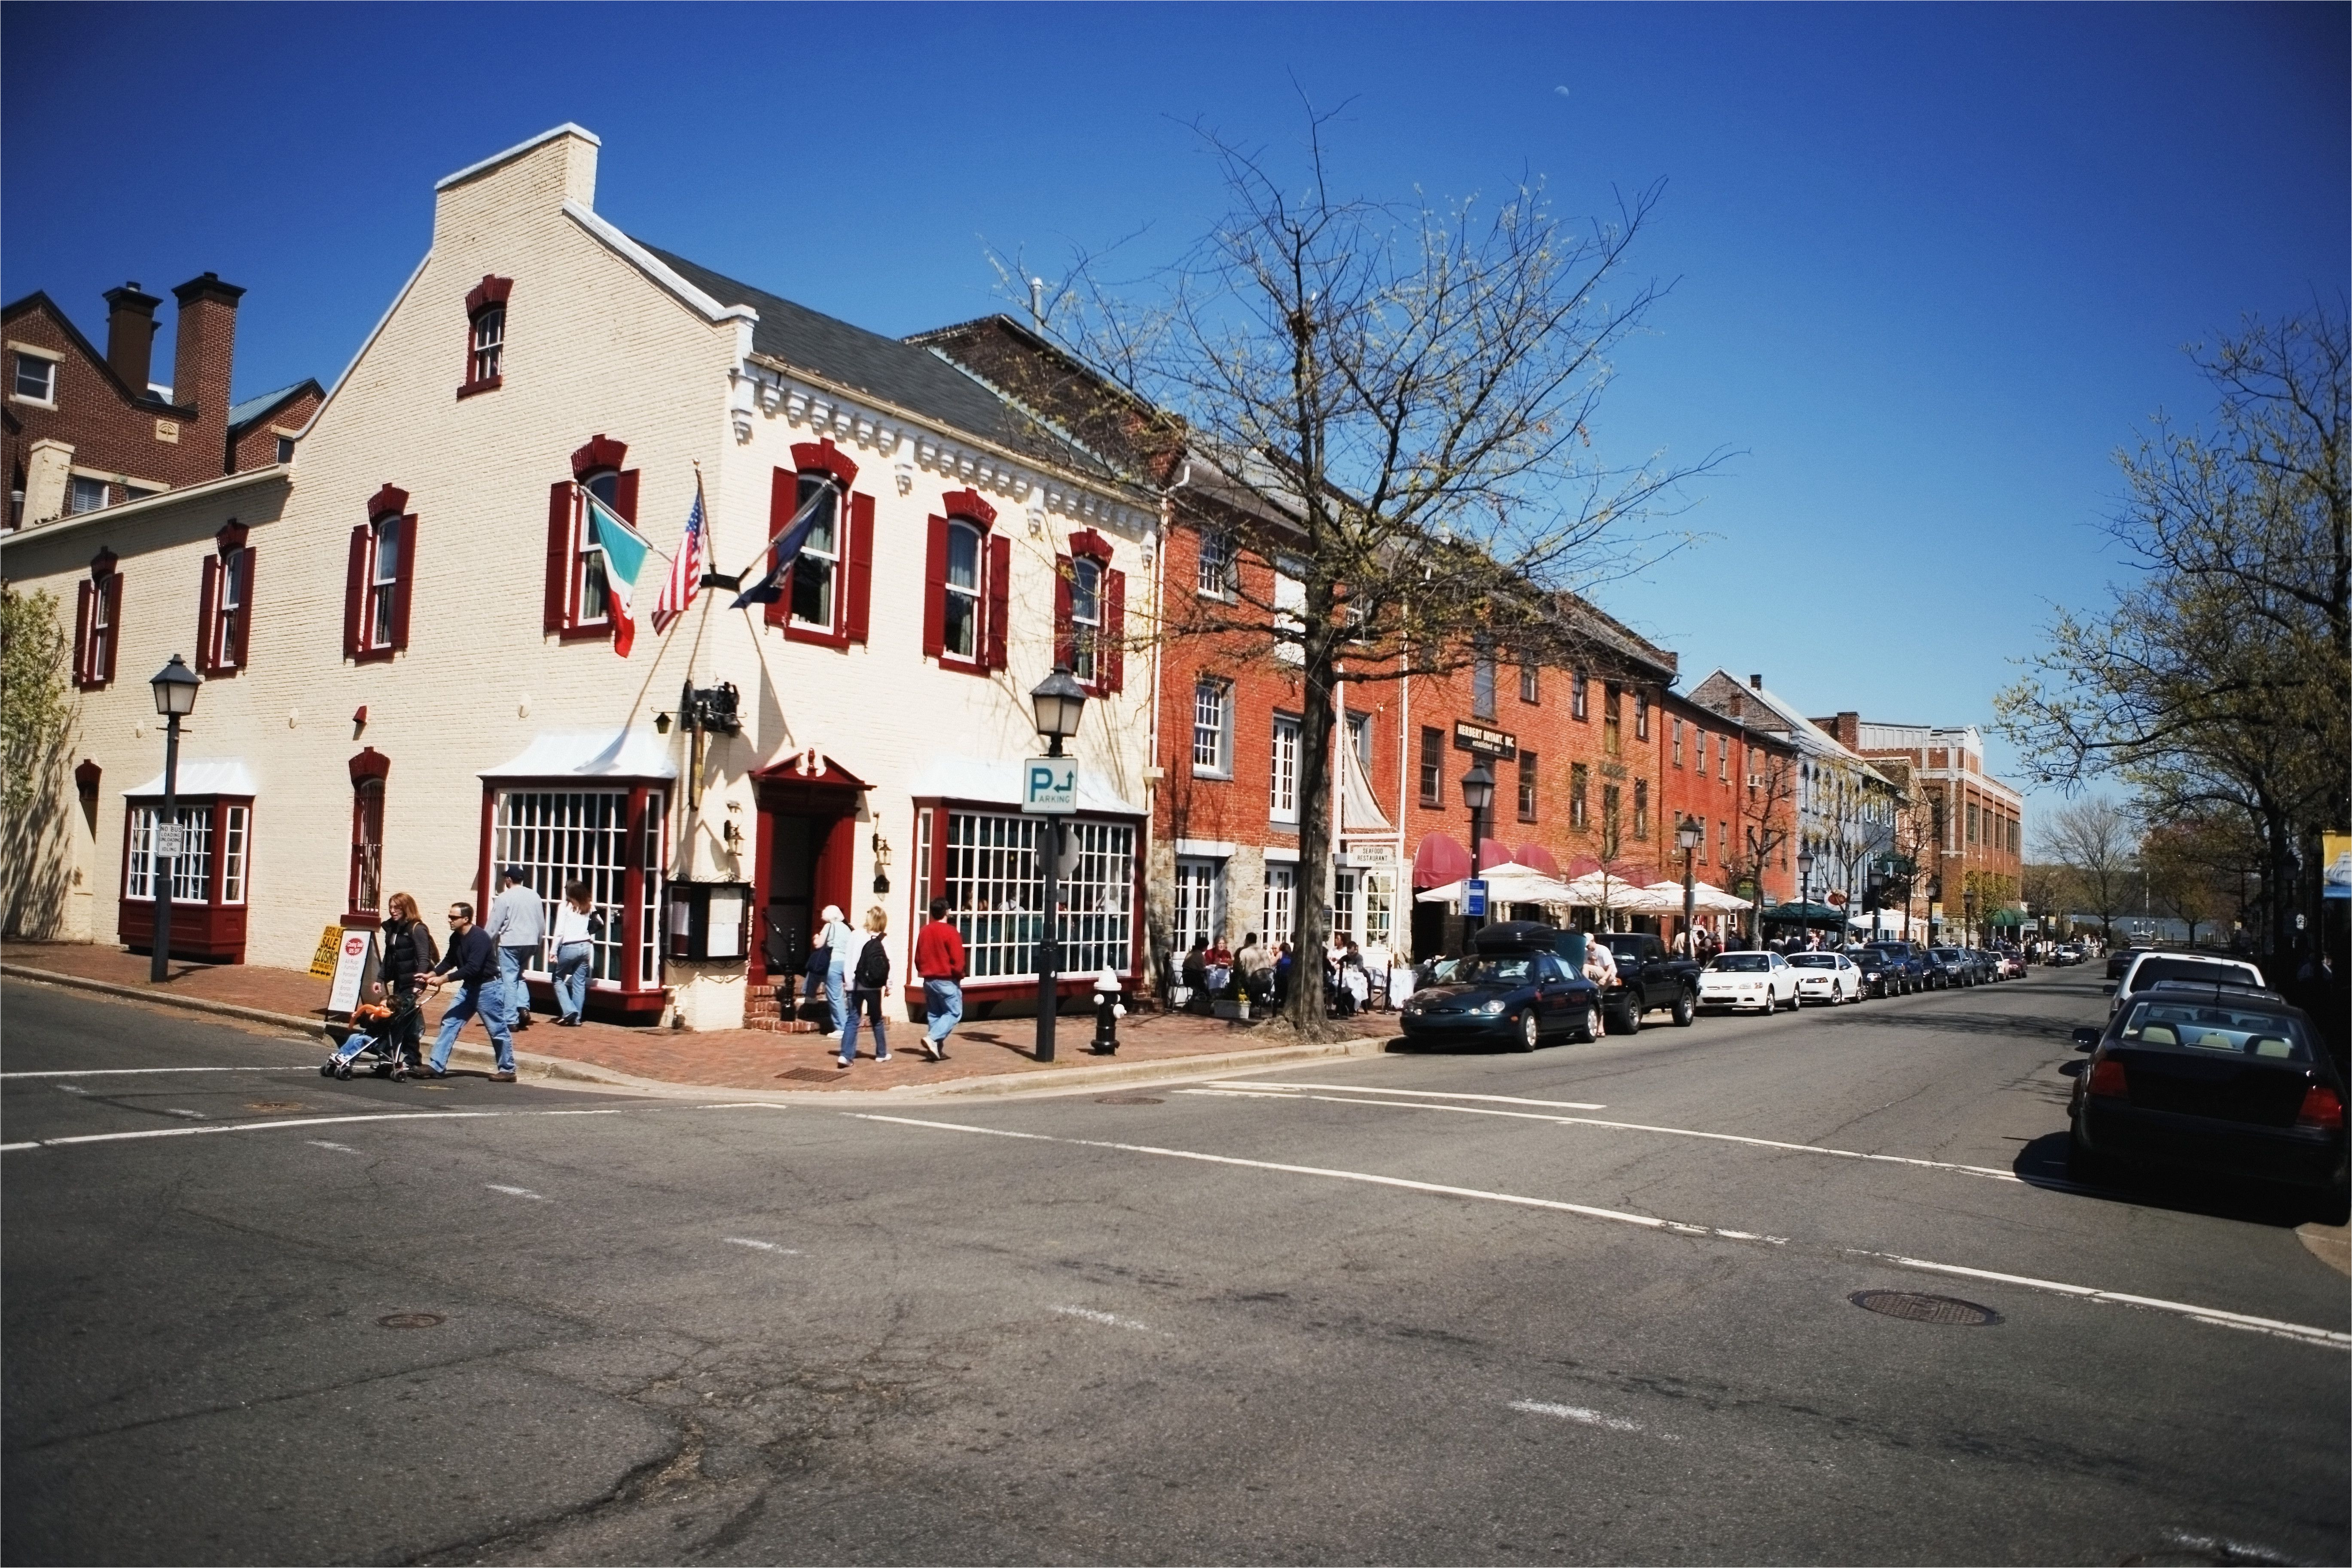 building along the street old town alexandria virginia usa 56808656 5c33a3024cedfd0001ac3048 jpg